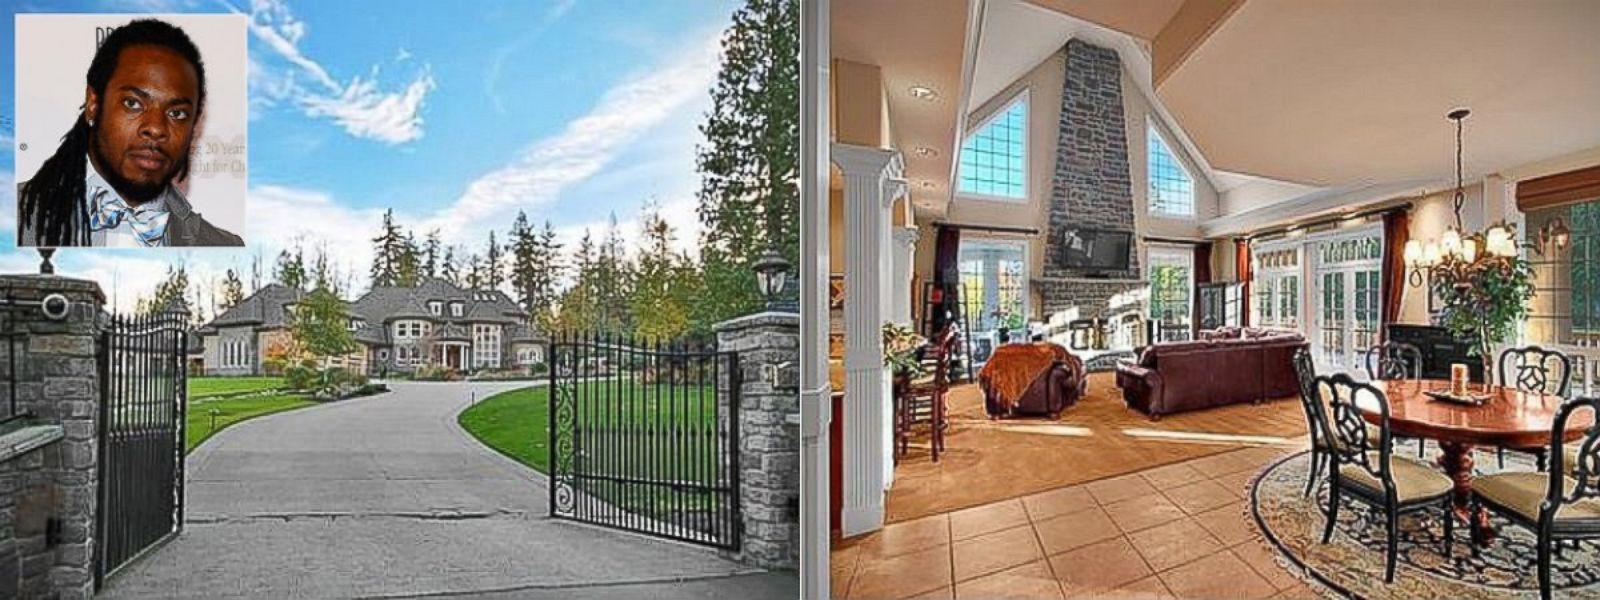 richard sherman house - 28 images - richard sherman house ...